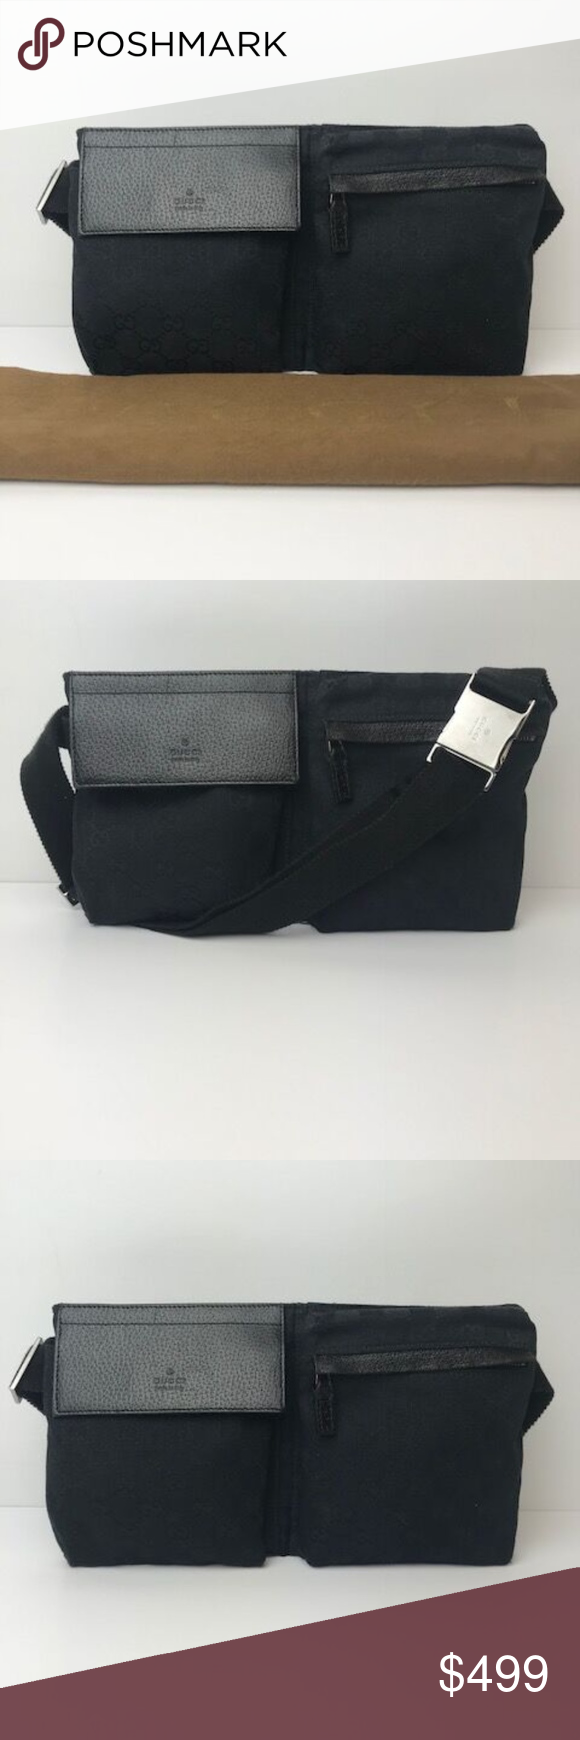 422ccc610f05 Authentic Gucci Black Monogram GG Belt Bag This is an authentic Gucci Belt  Bag in black